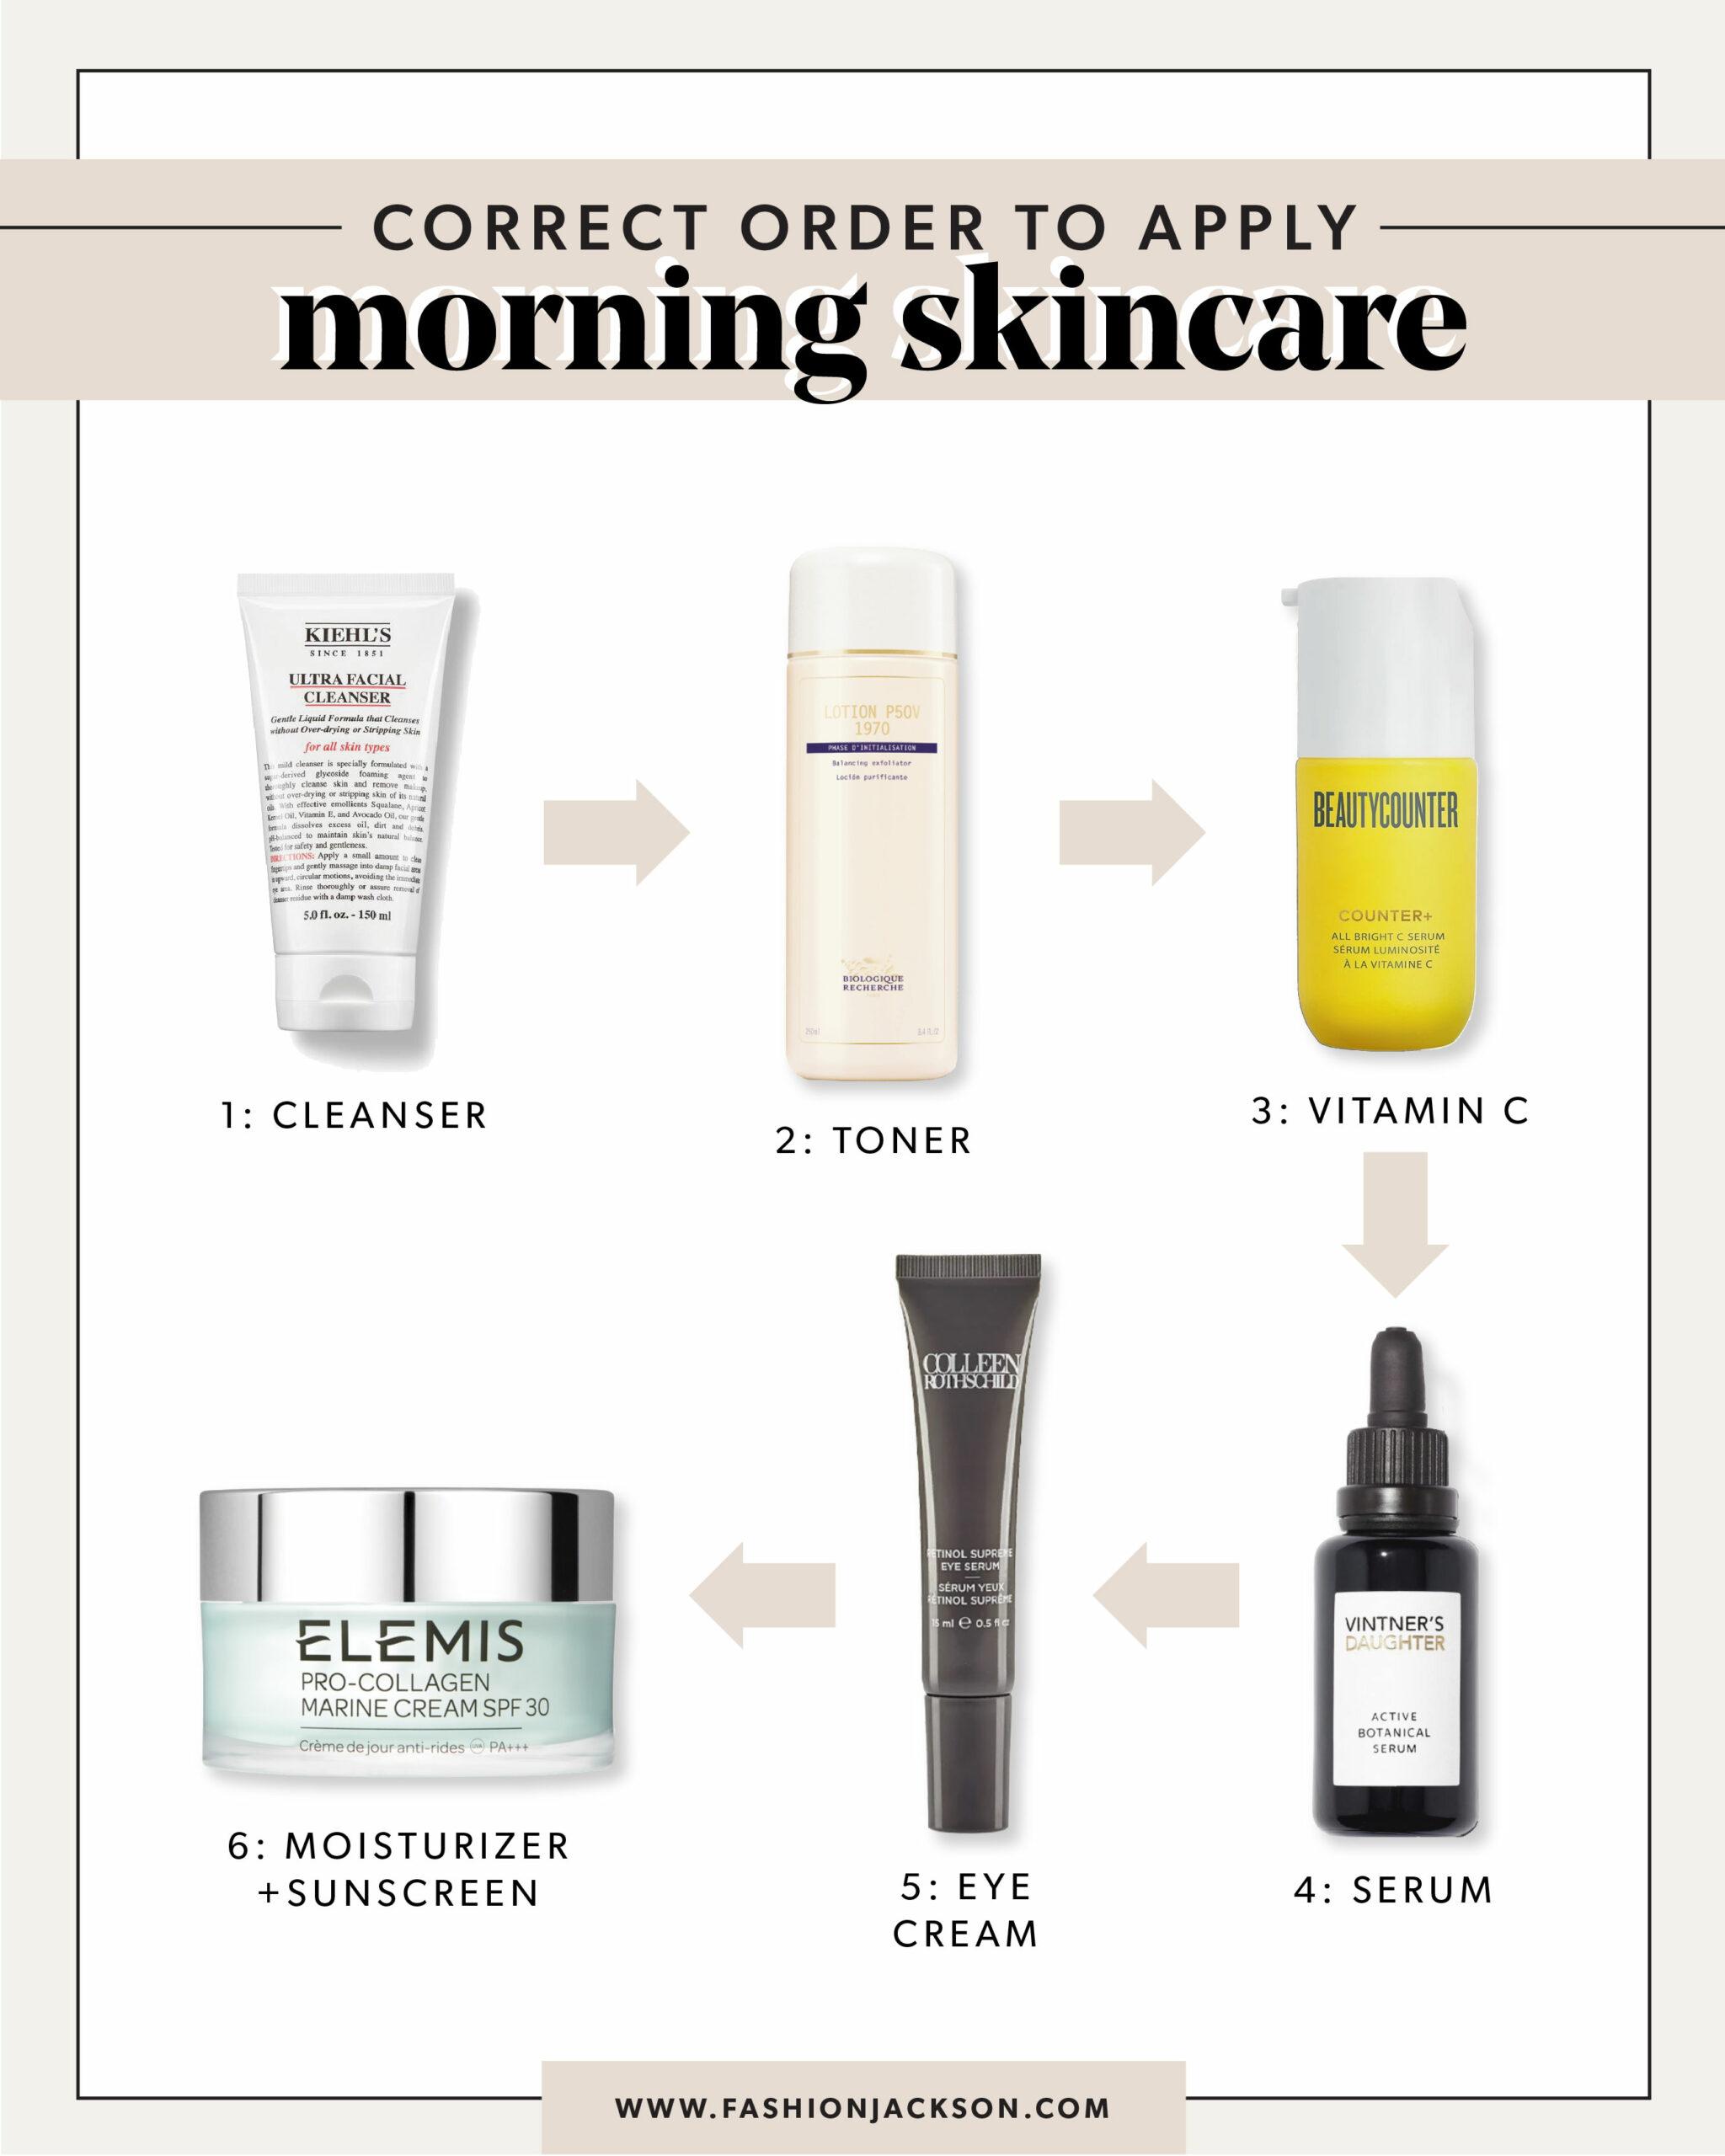 fashion jackson correct order to apply skincare morning routine